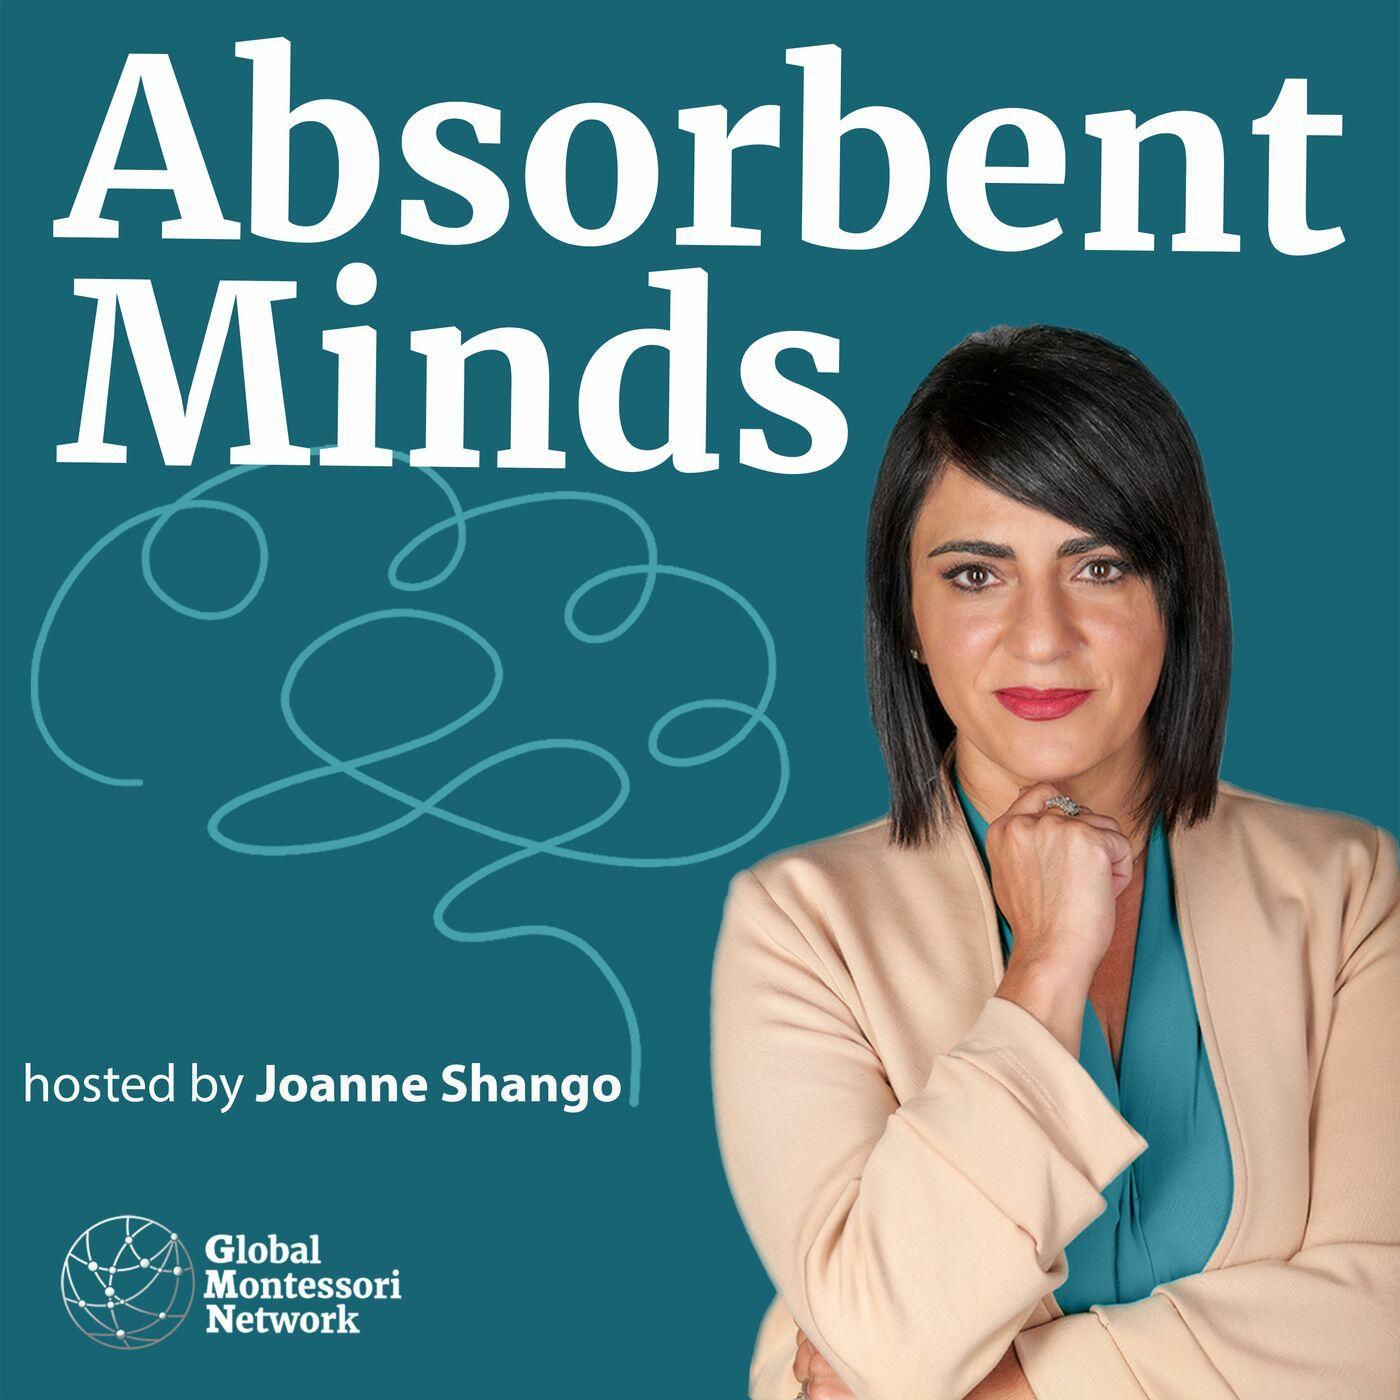 Absorbent Minds